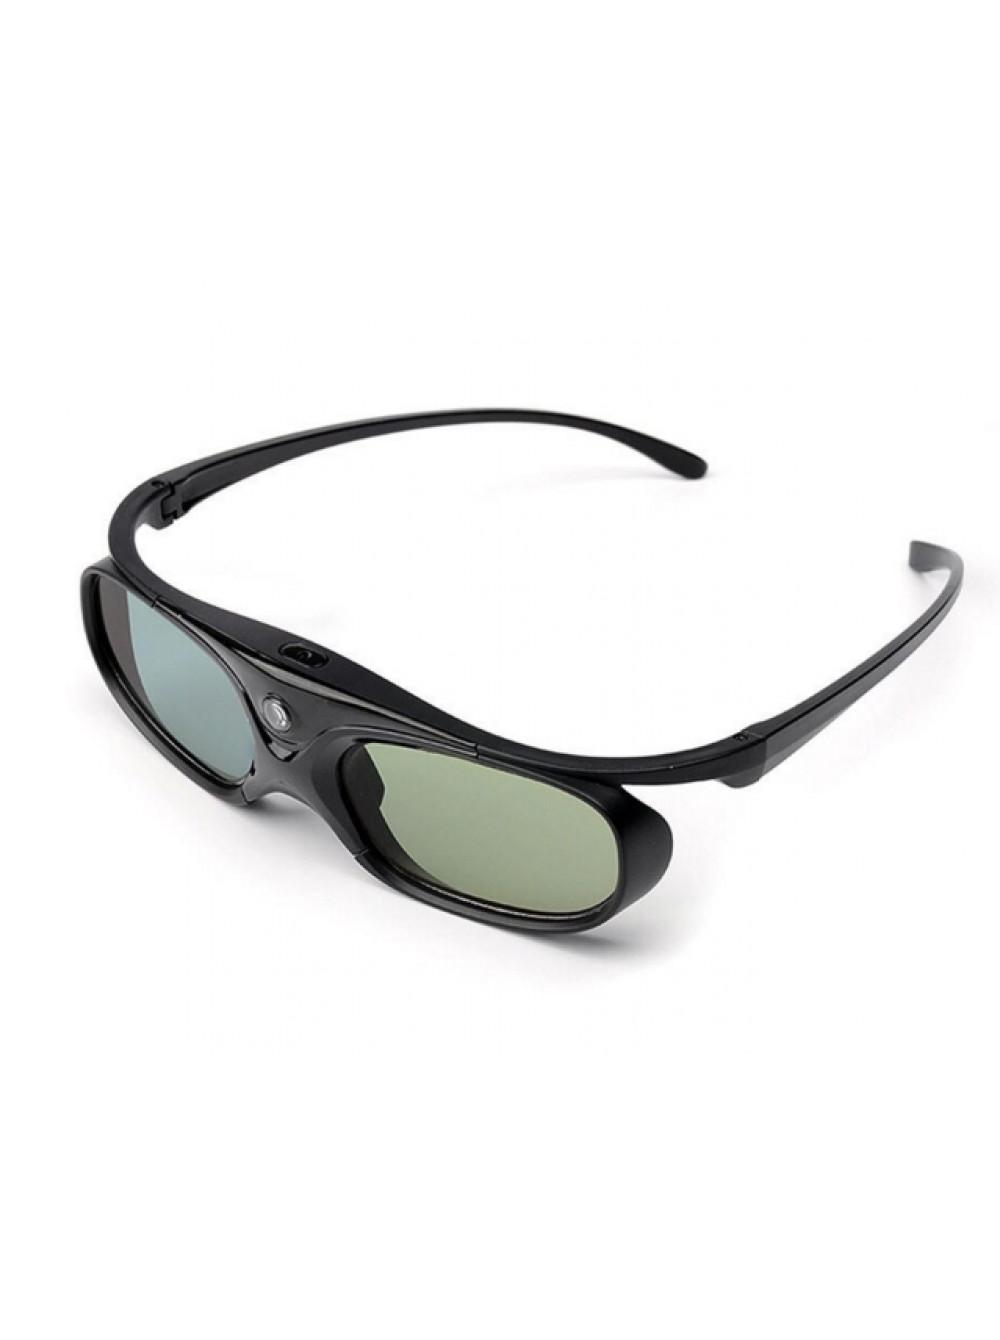 3D Glass XGIMI (3D очки для проектора XGIMI)